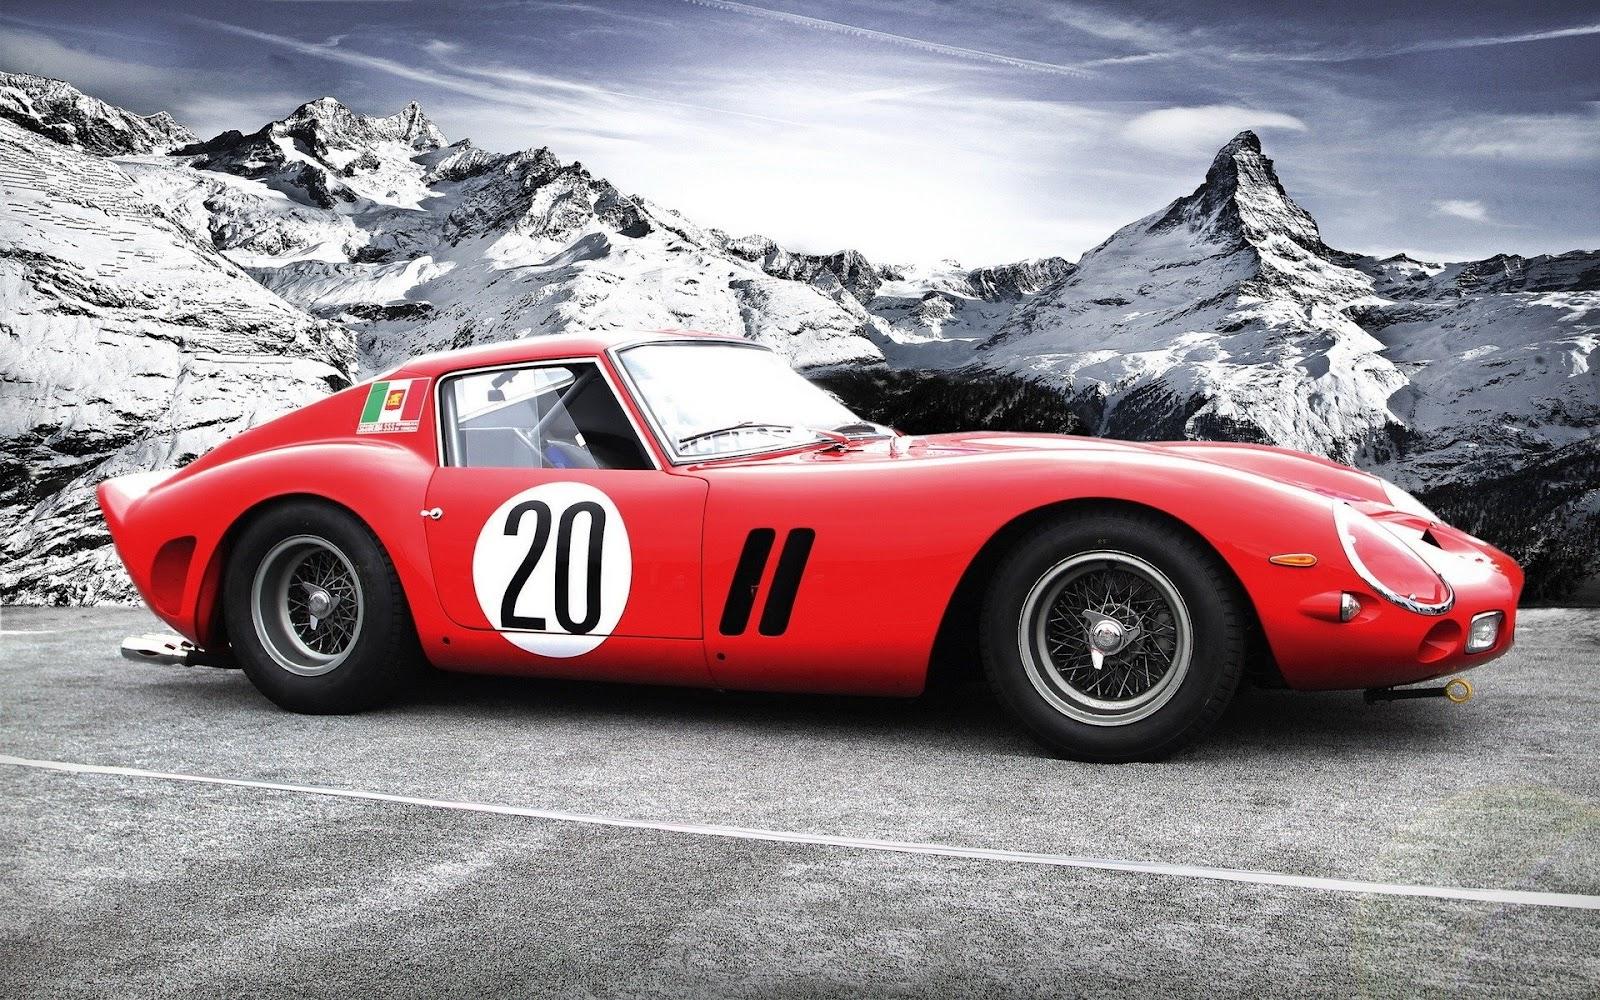 Ferrari 250 Gto Wallpapers: Ferrari 250 GTO Wallpaper 03